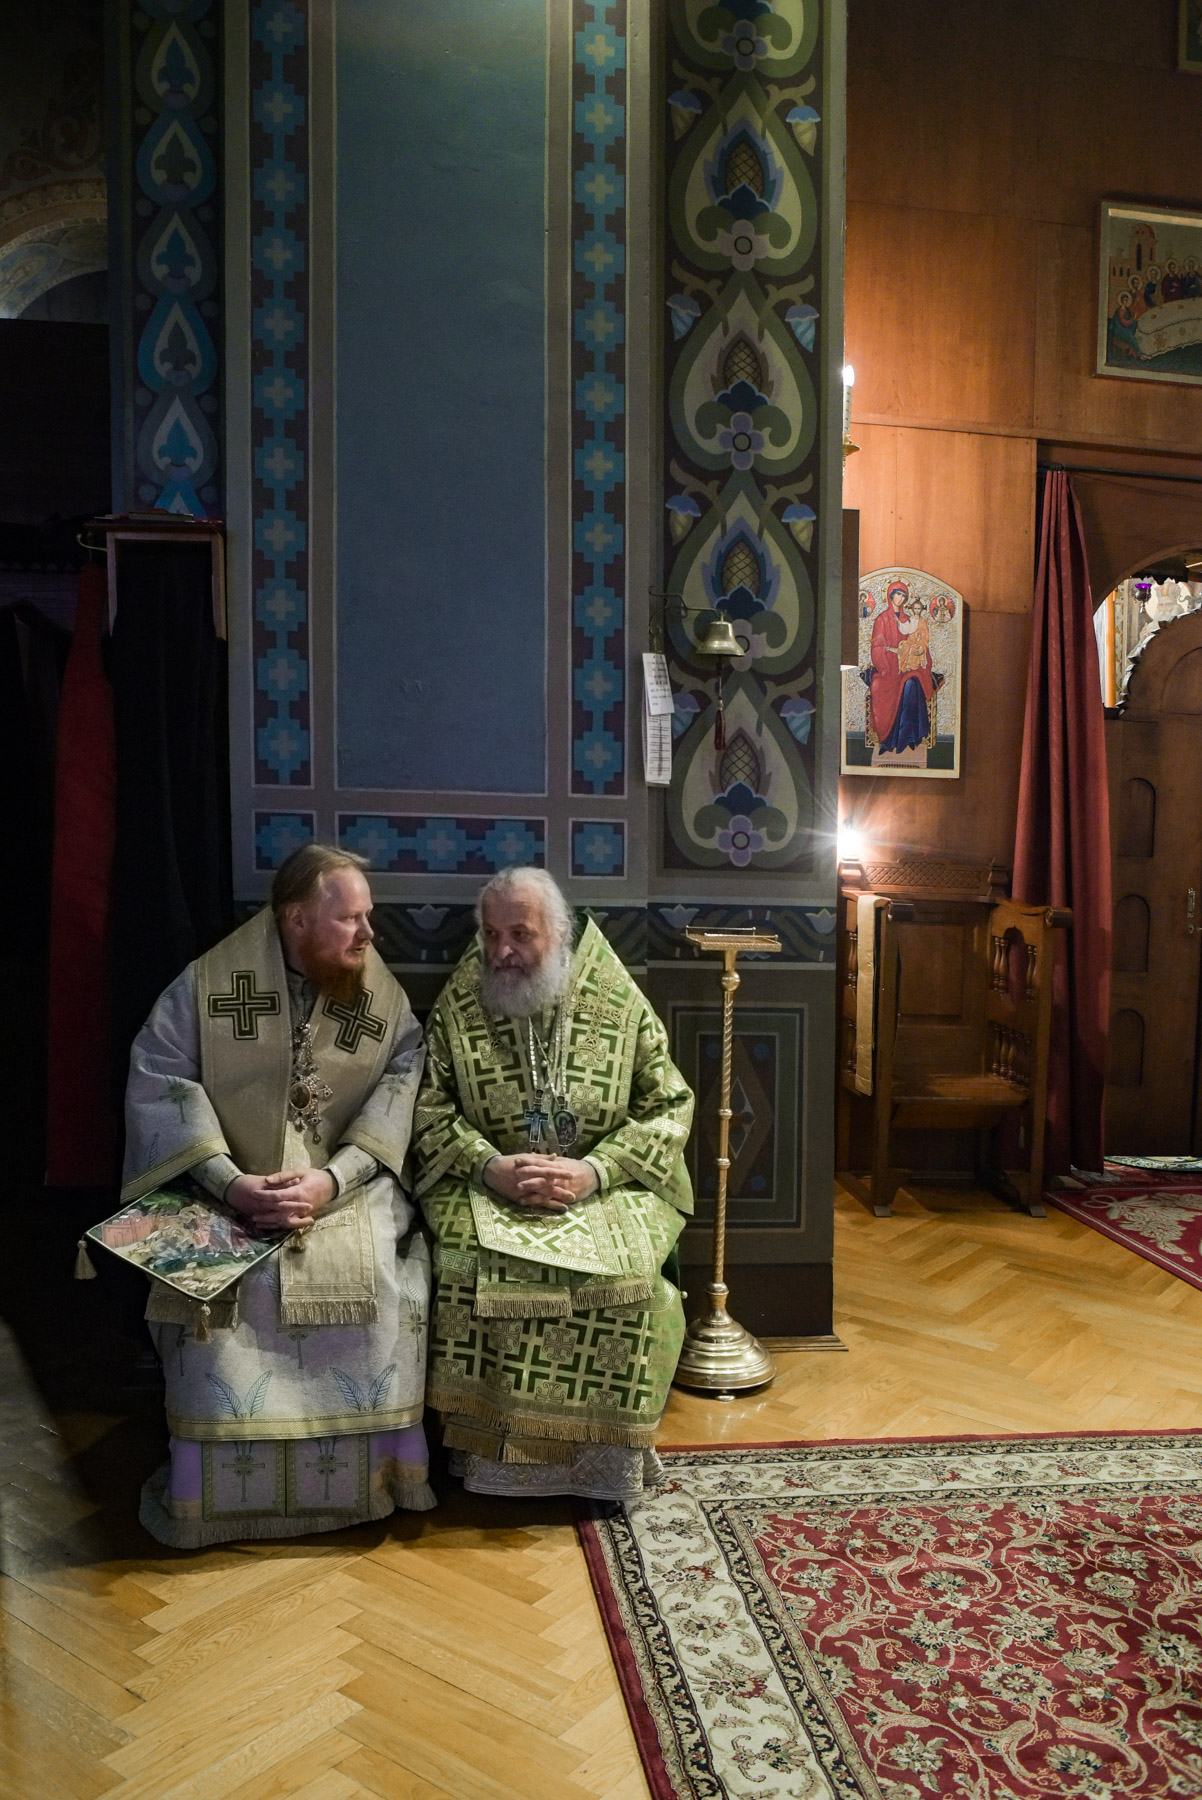 photos of orthodox christmas 0032 2